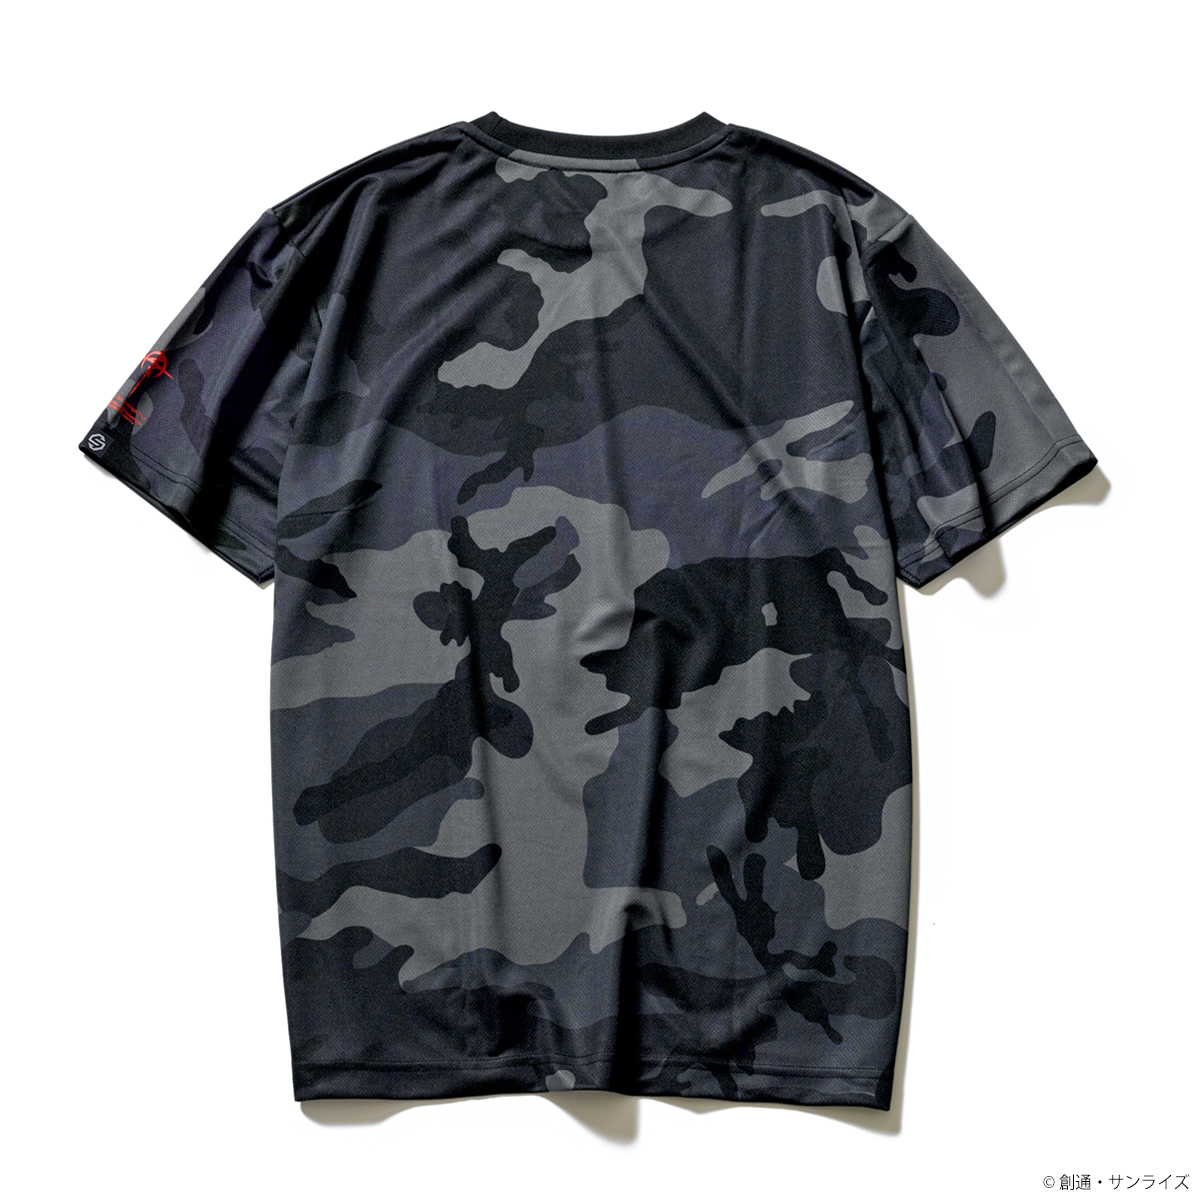 STRICT-G 『機動戦士ガンダム 閃光のハサウェイ』 ドライカモフラージュTシャツ マフティー